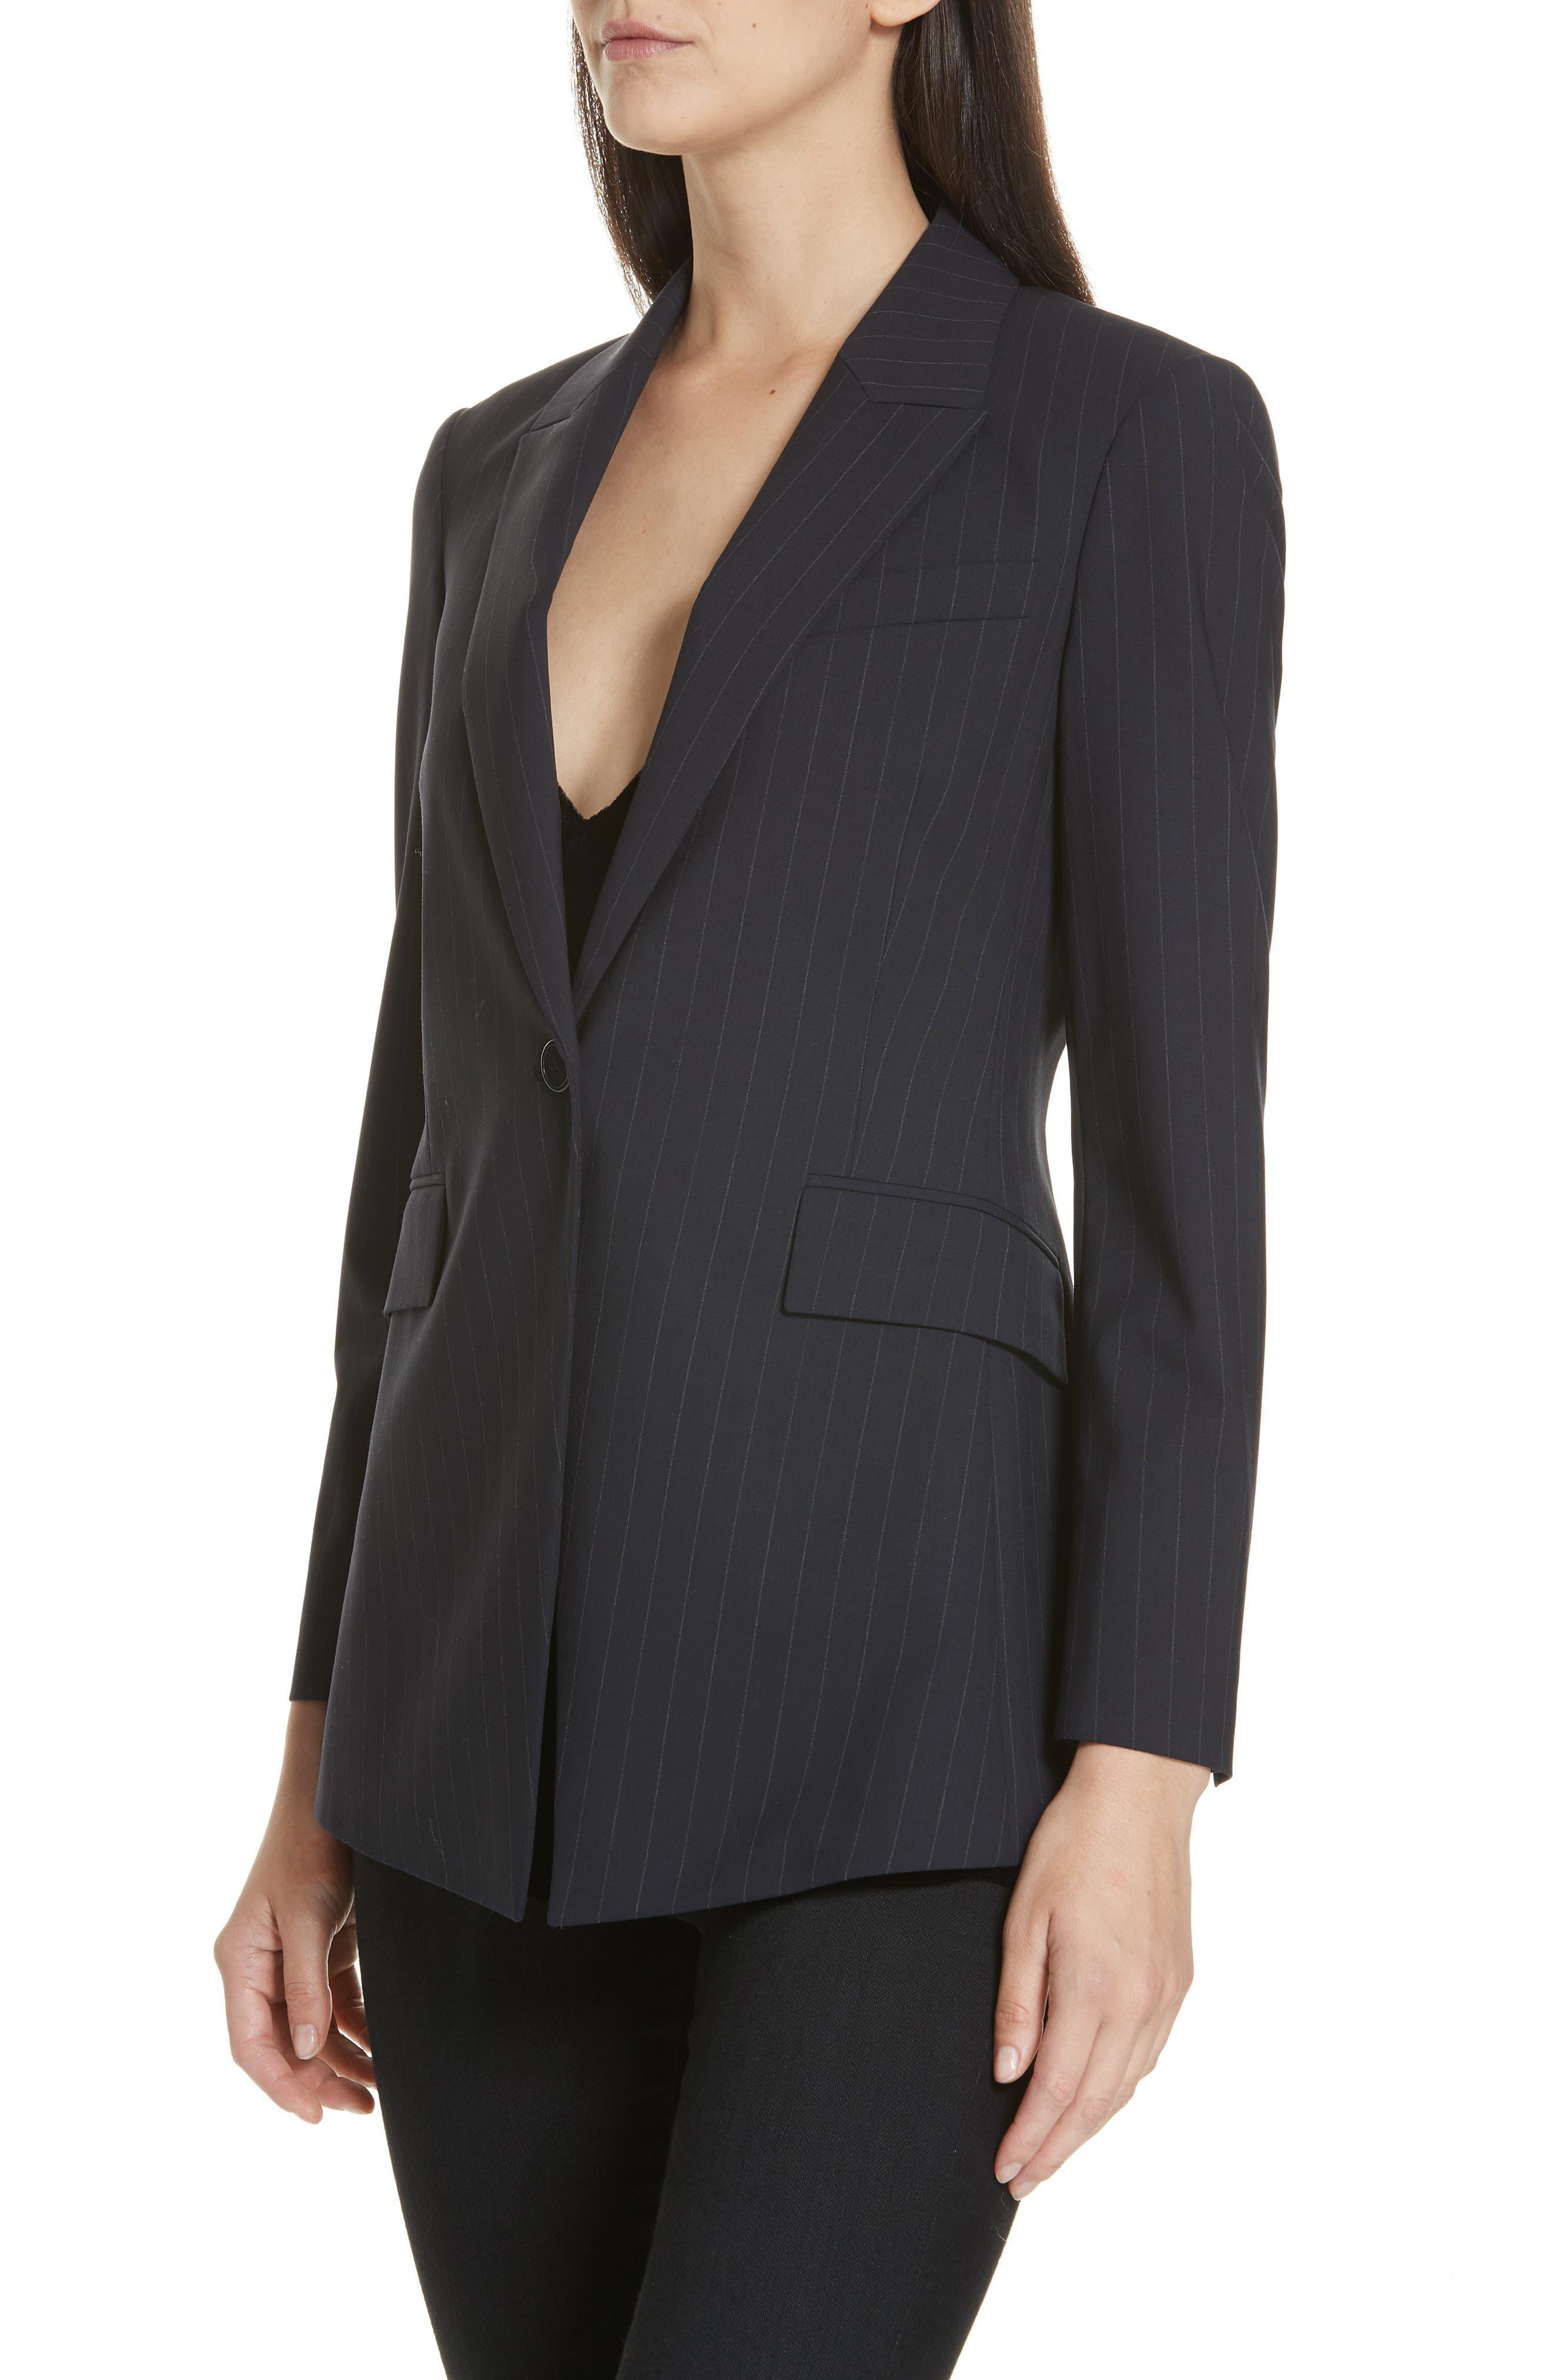 Etienette B Good Wool Suit Jacket,                             Alternate thumbnail 27, color,